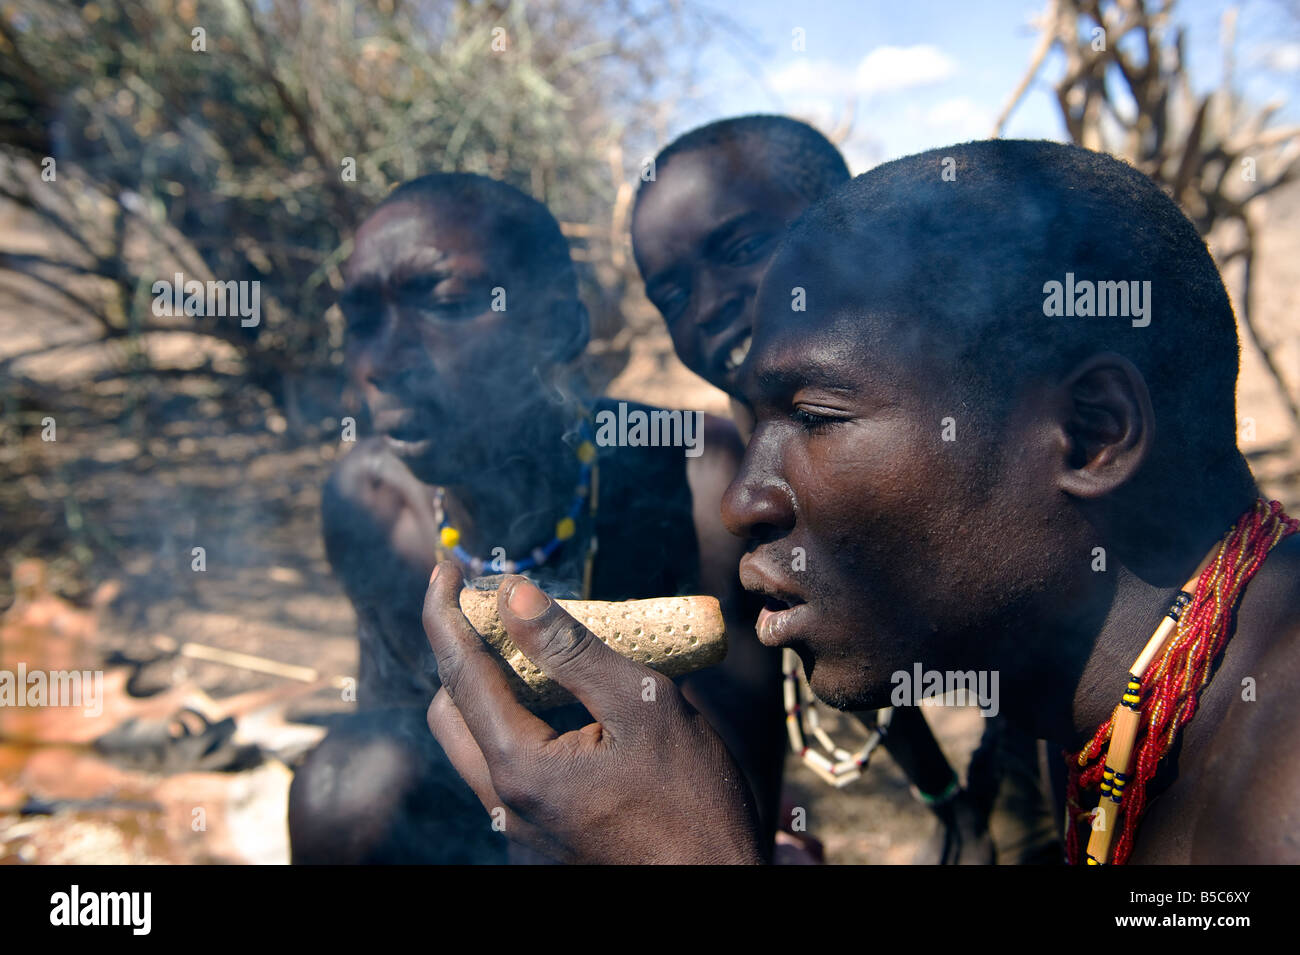 A man of the Hadza tribe smoking a pipe with marijuana Lake Eyasi Tanzania - Stock Image